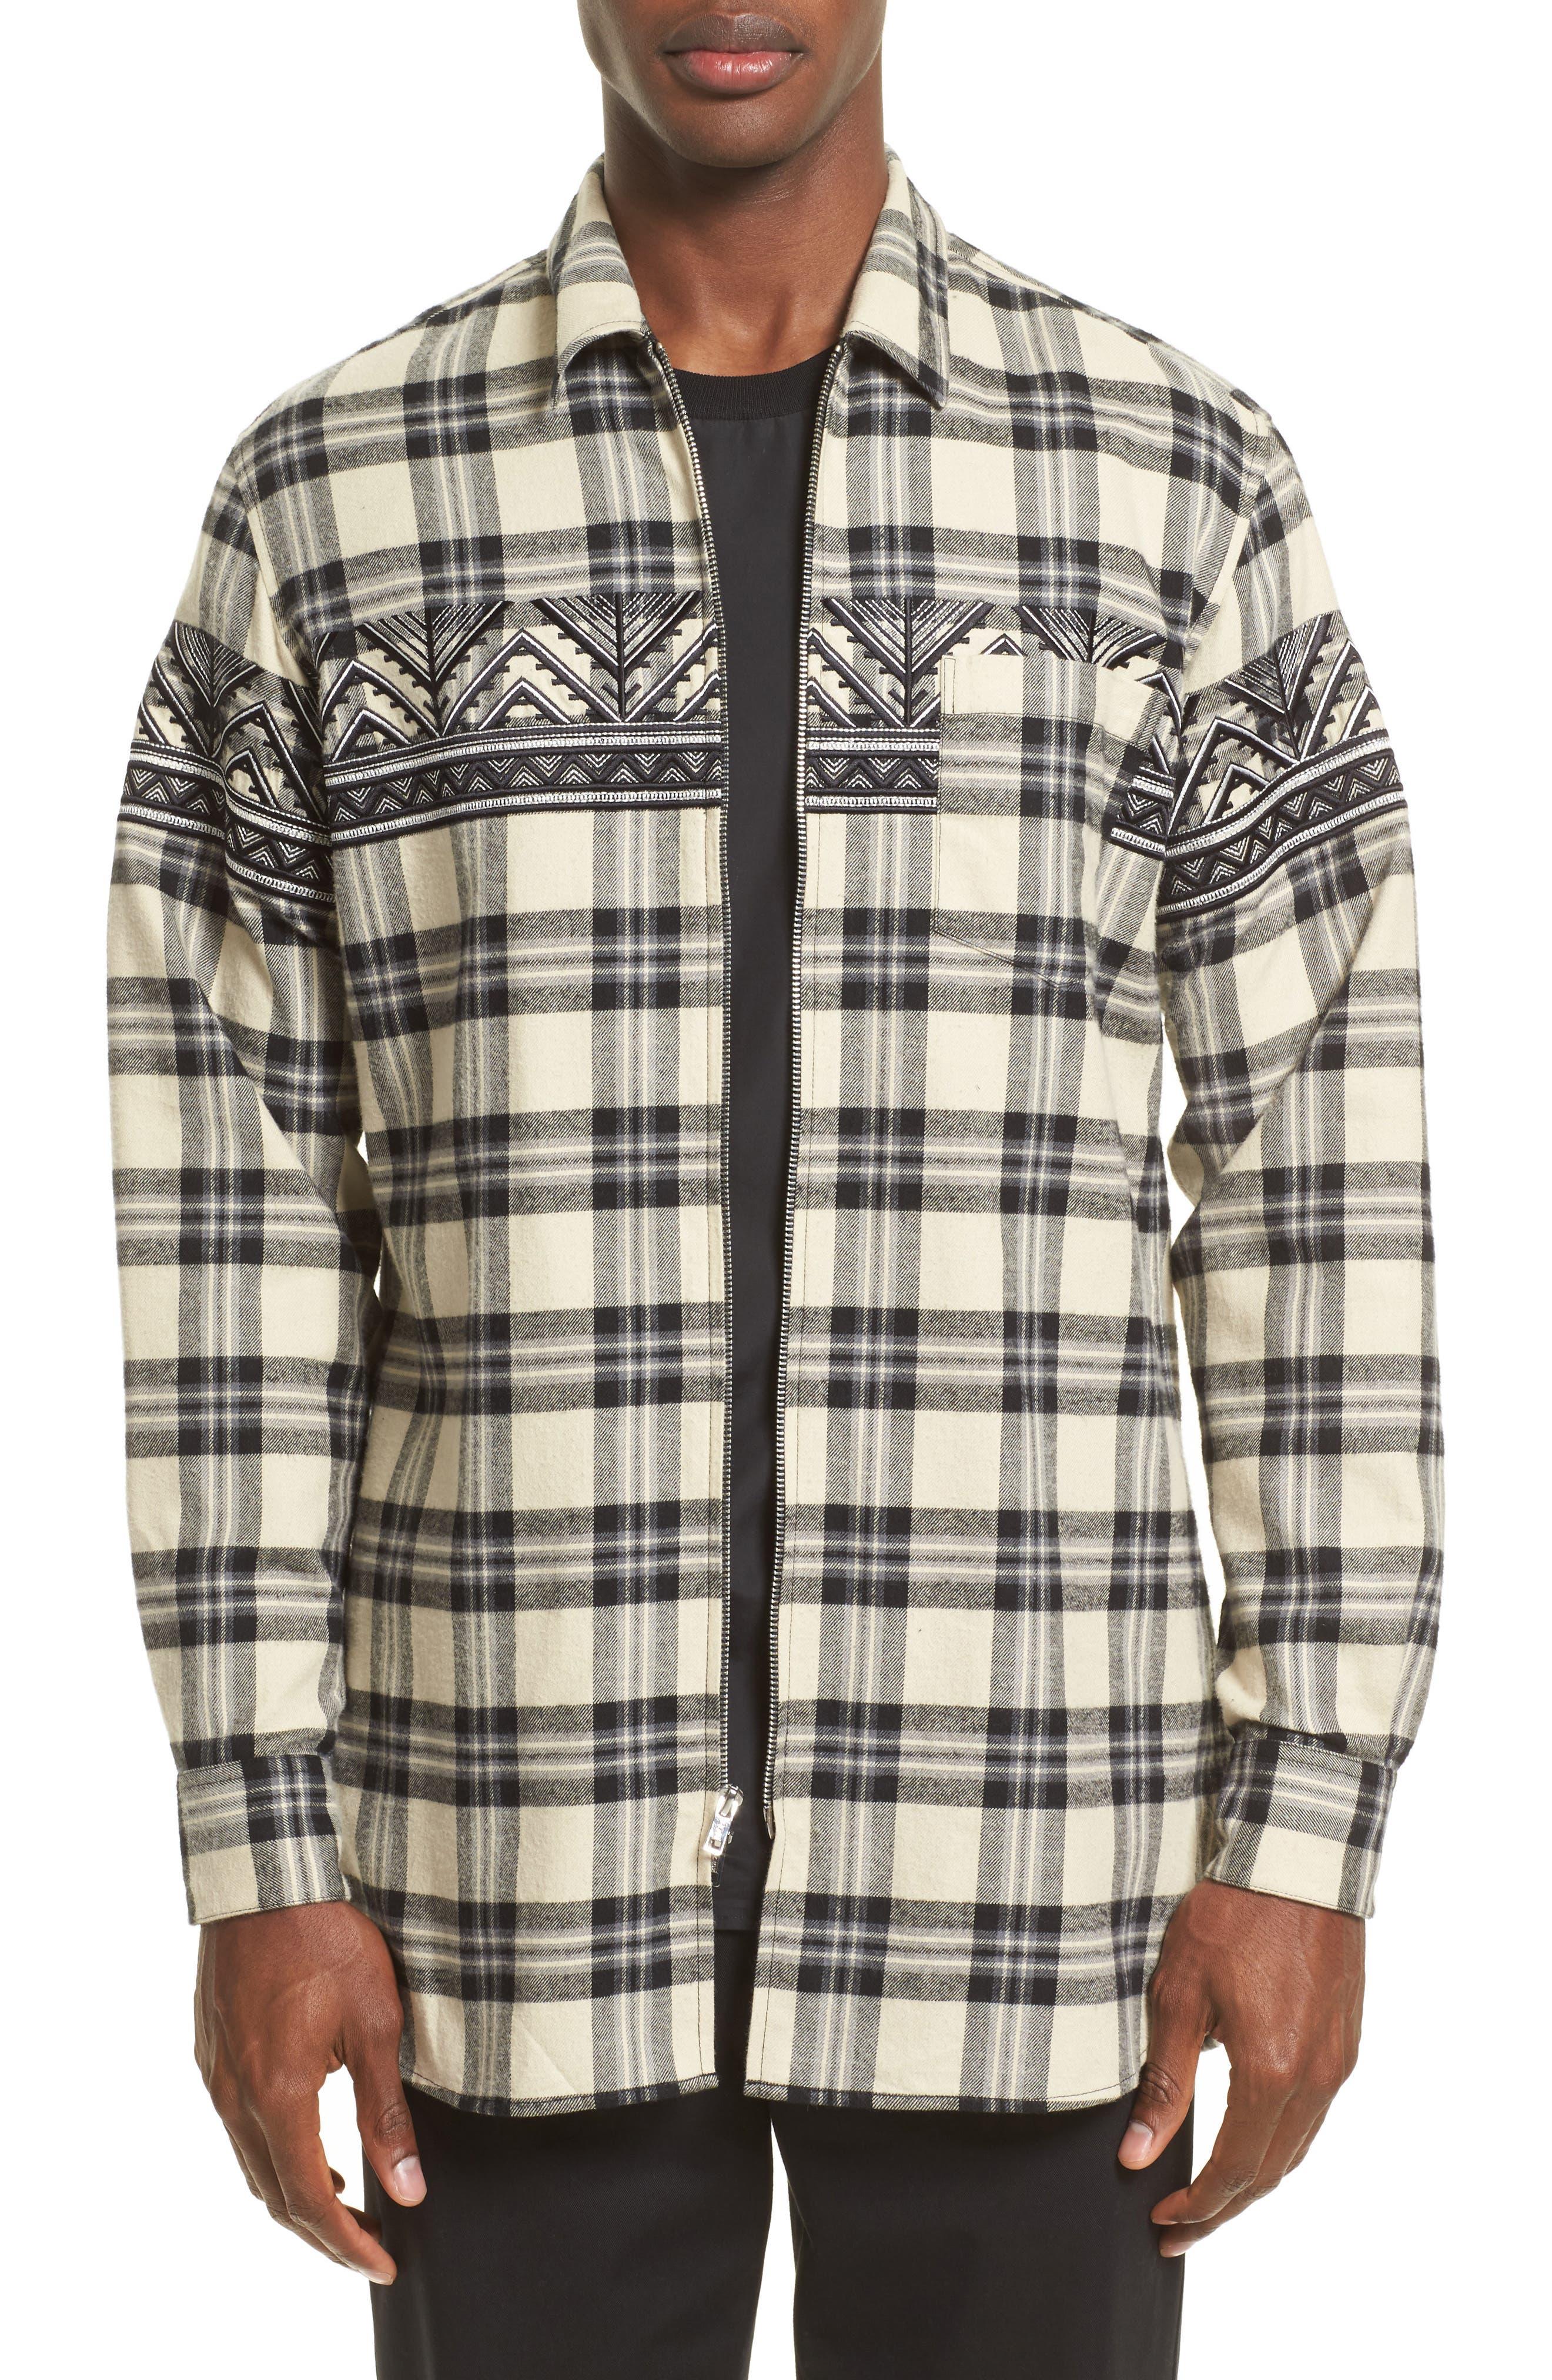 Main Image - 3.1 Phillip Lim VIP Elongated Zip Flannel Shirt